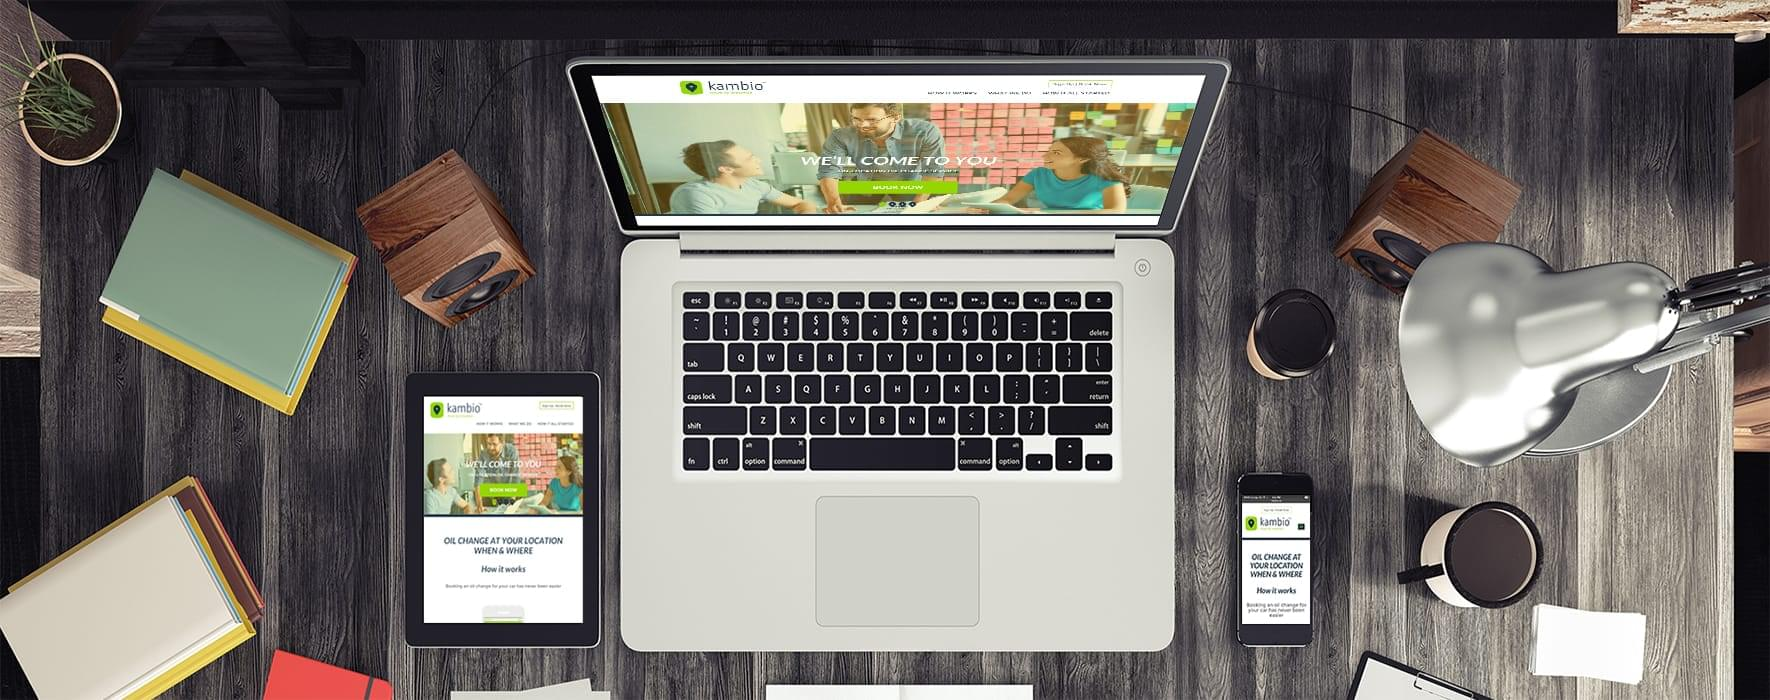 Kambio for website under